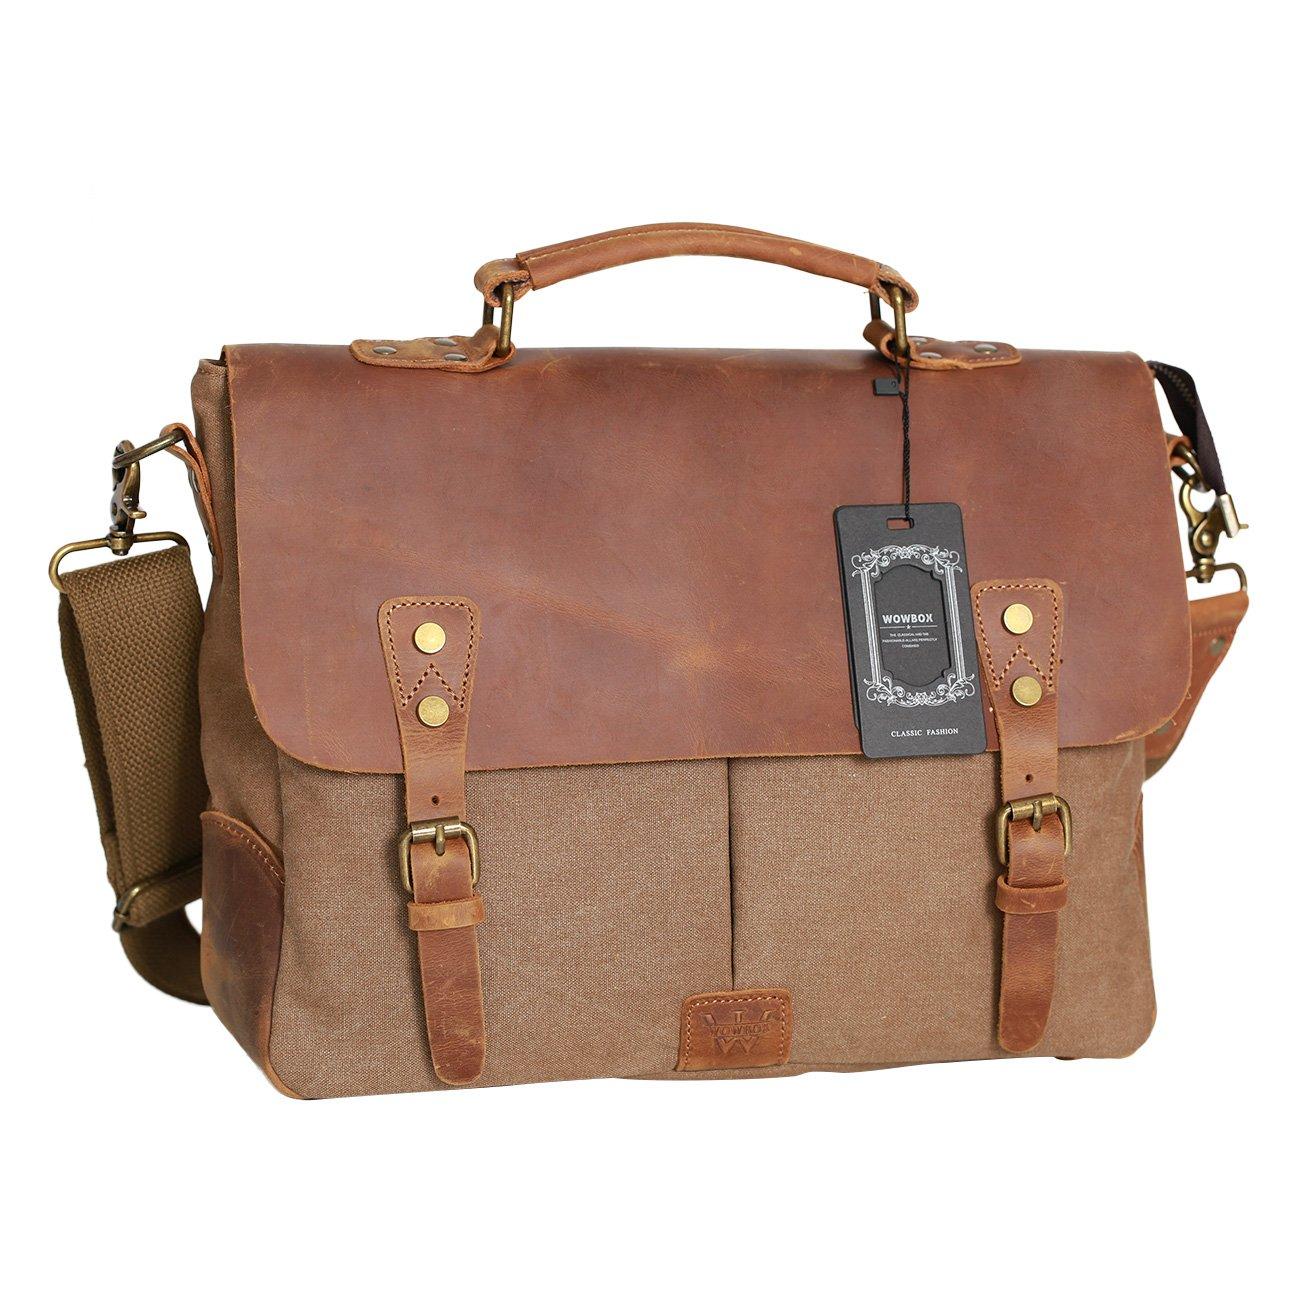 WOWBOX Messenger Bag Satchel Vintage Canvas Leather 13''(L) x10.5''(H) x 4.1''(W) (Coffee)